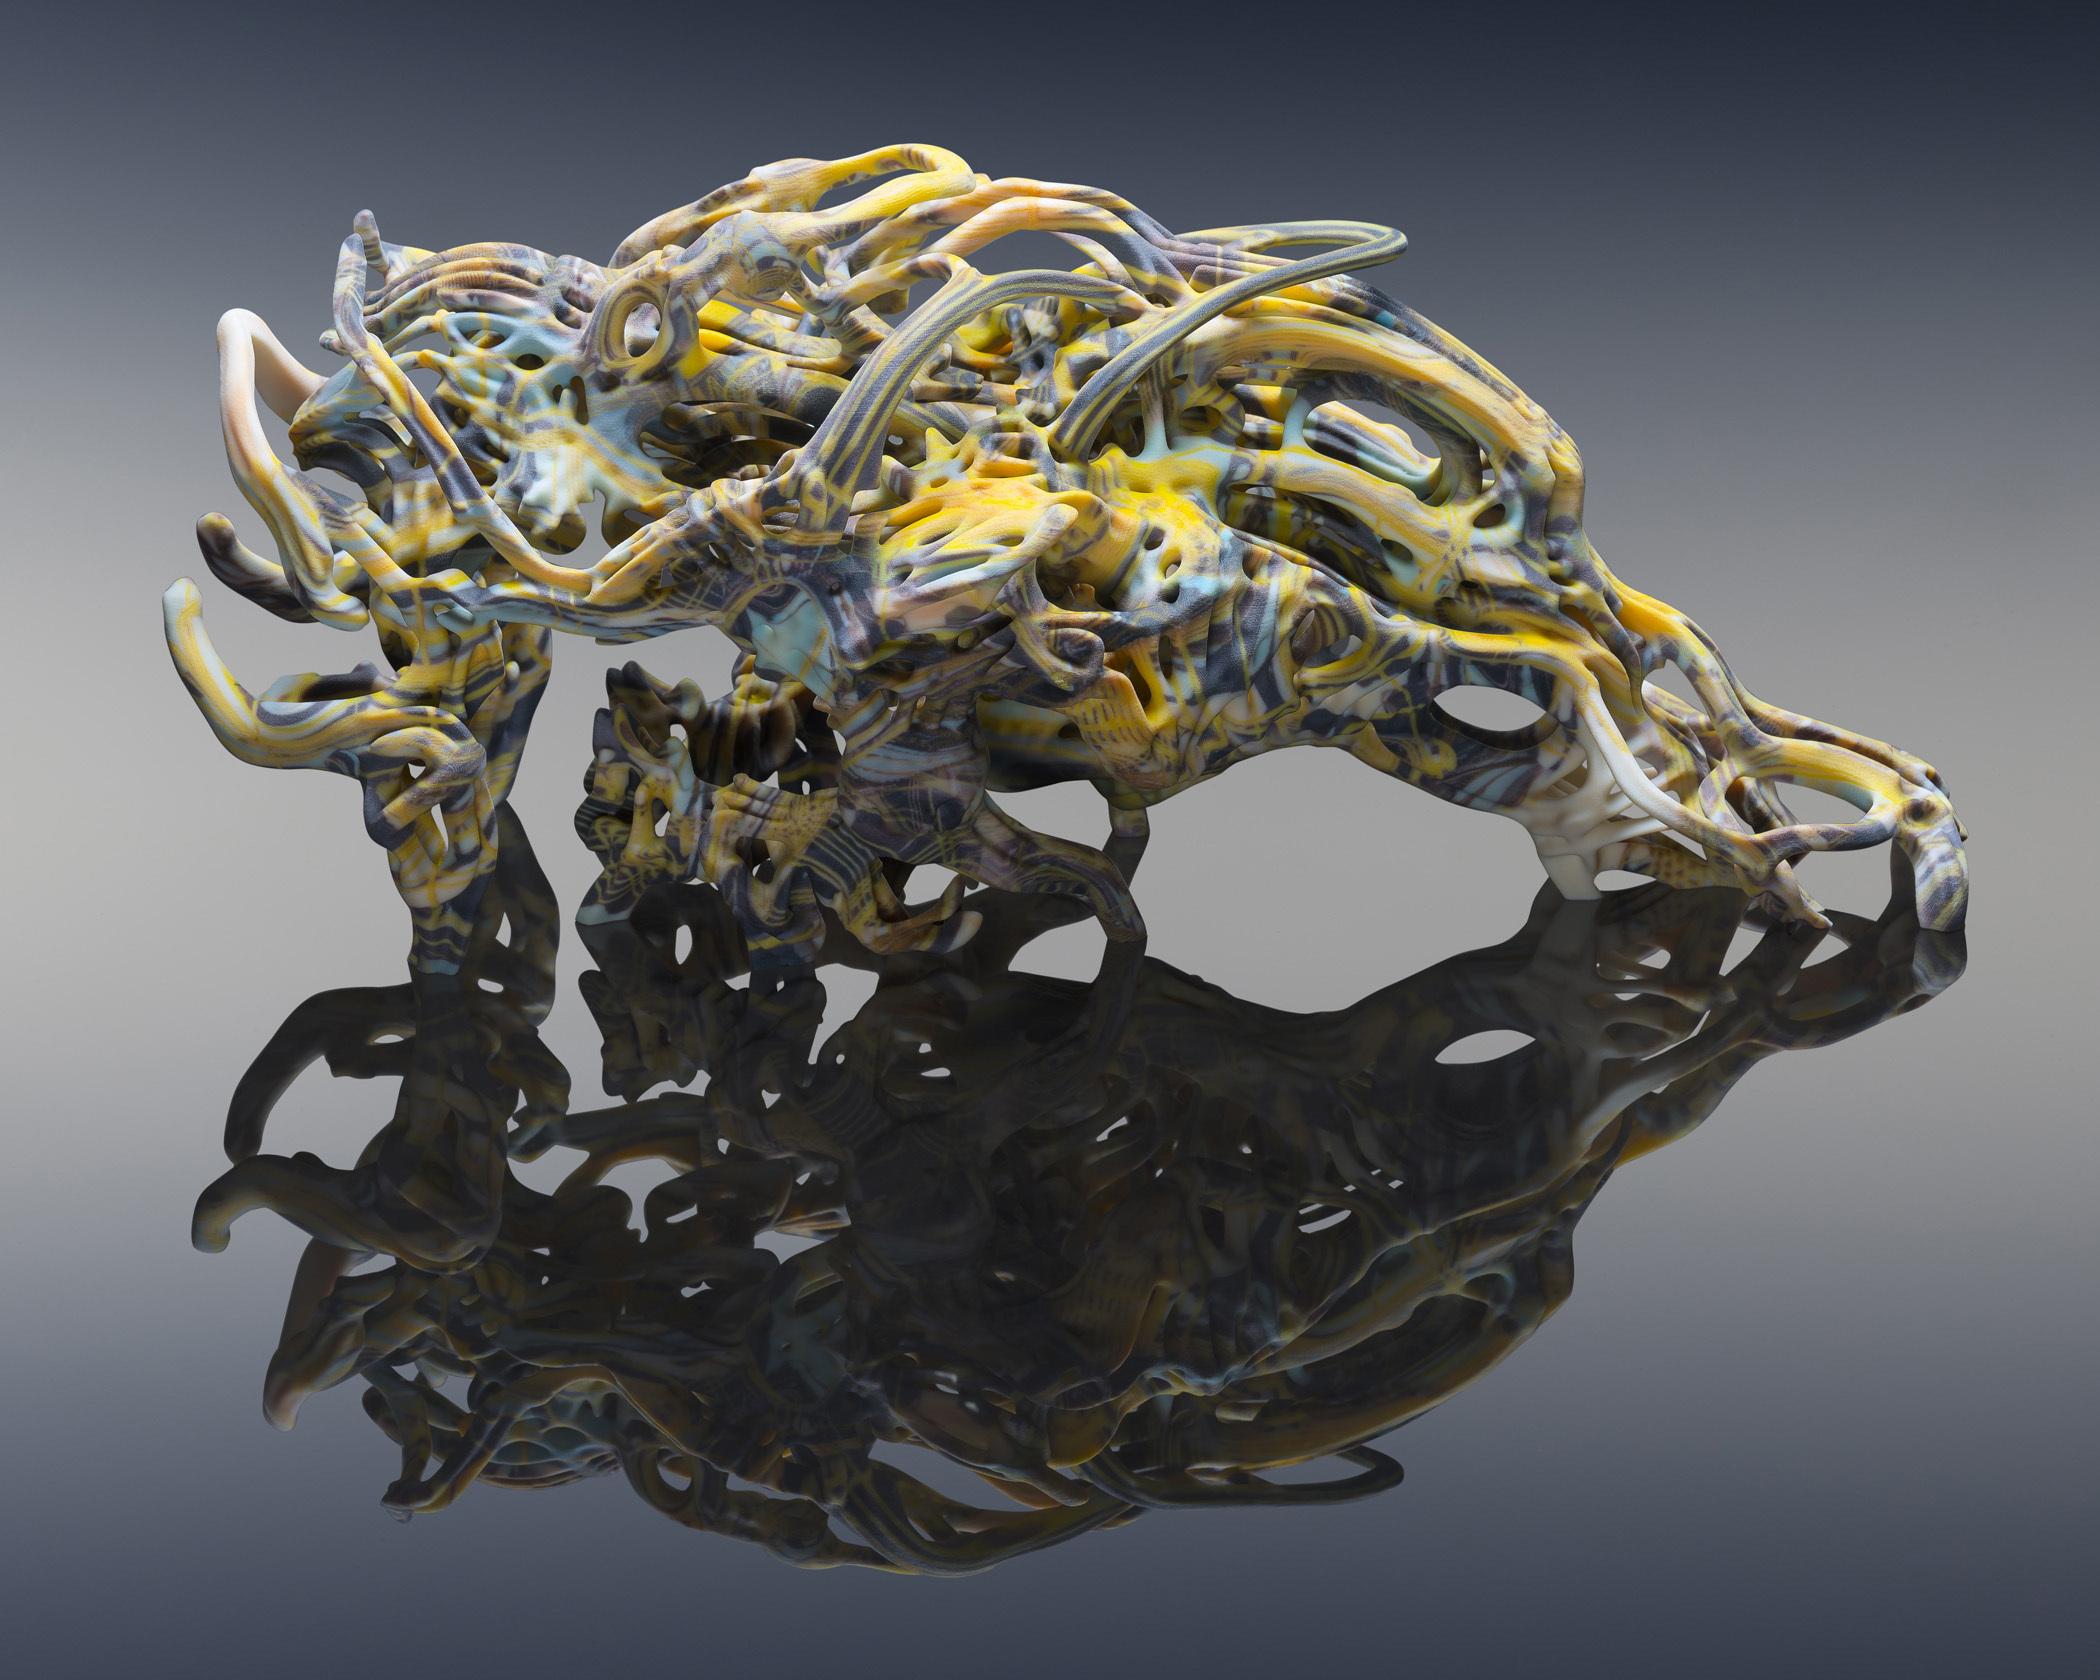 Компания XJet презентует революционную технологию 3D-печати металлом